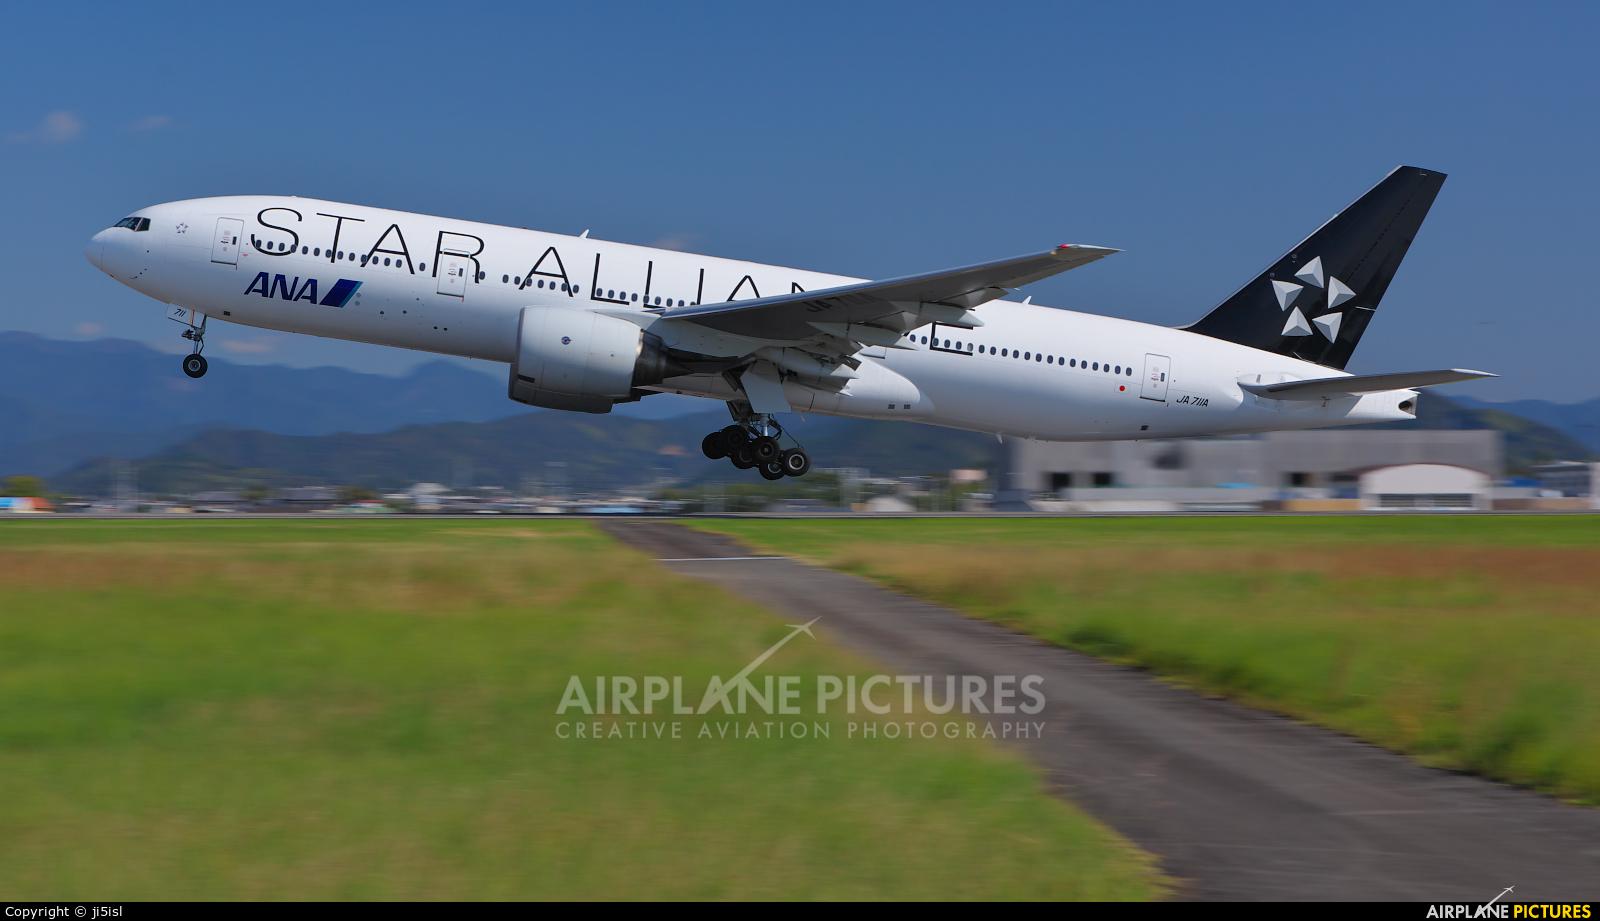 ANA - All Nippon Airways JA711A aircraft at Kōchi